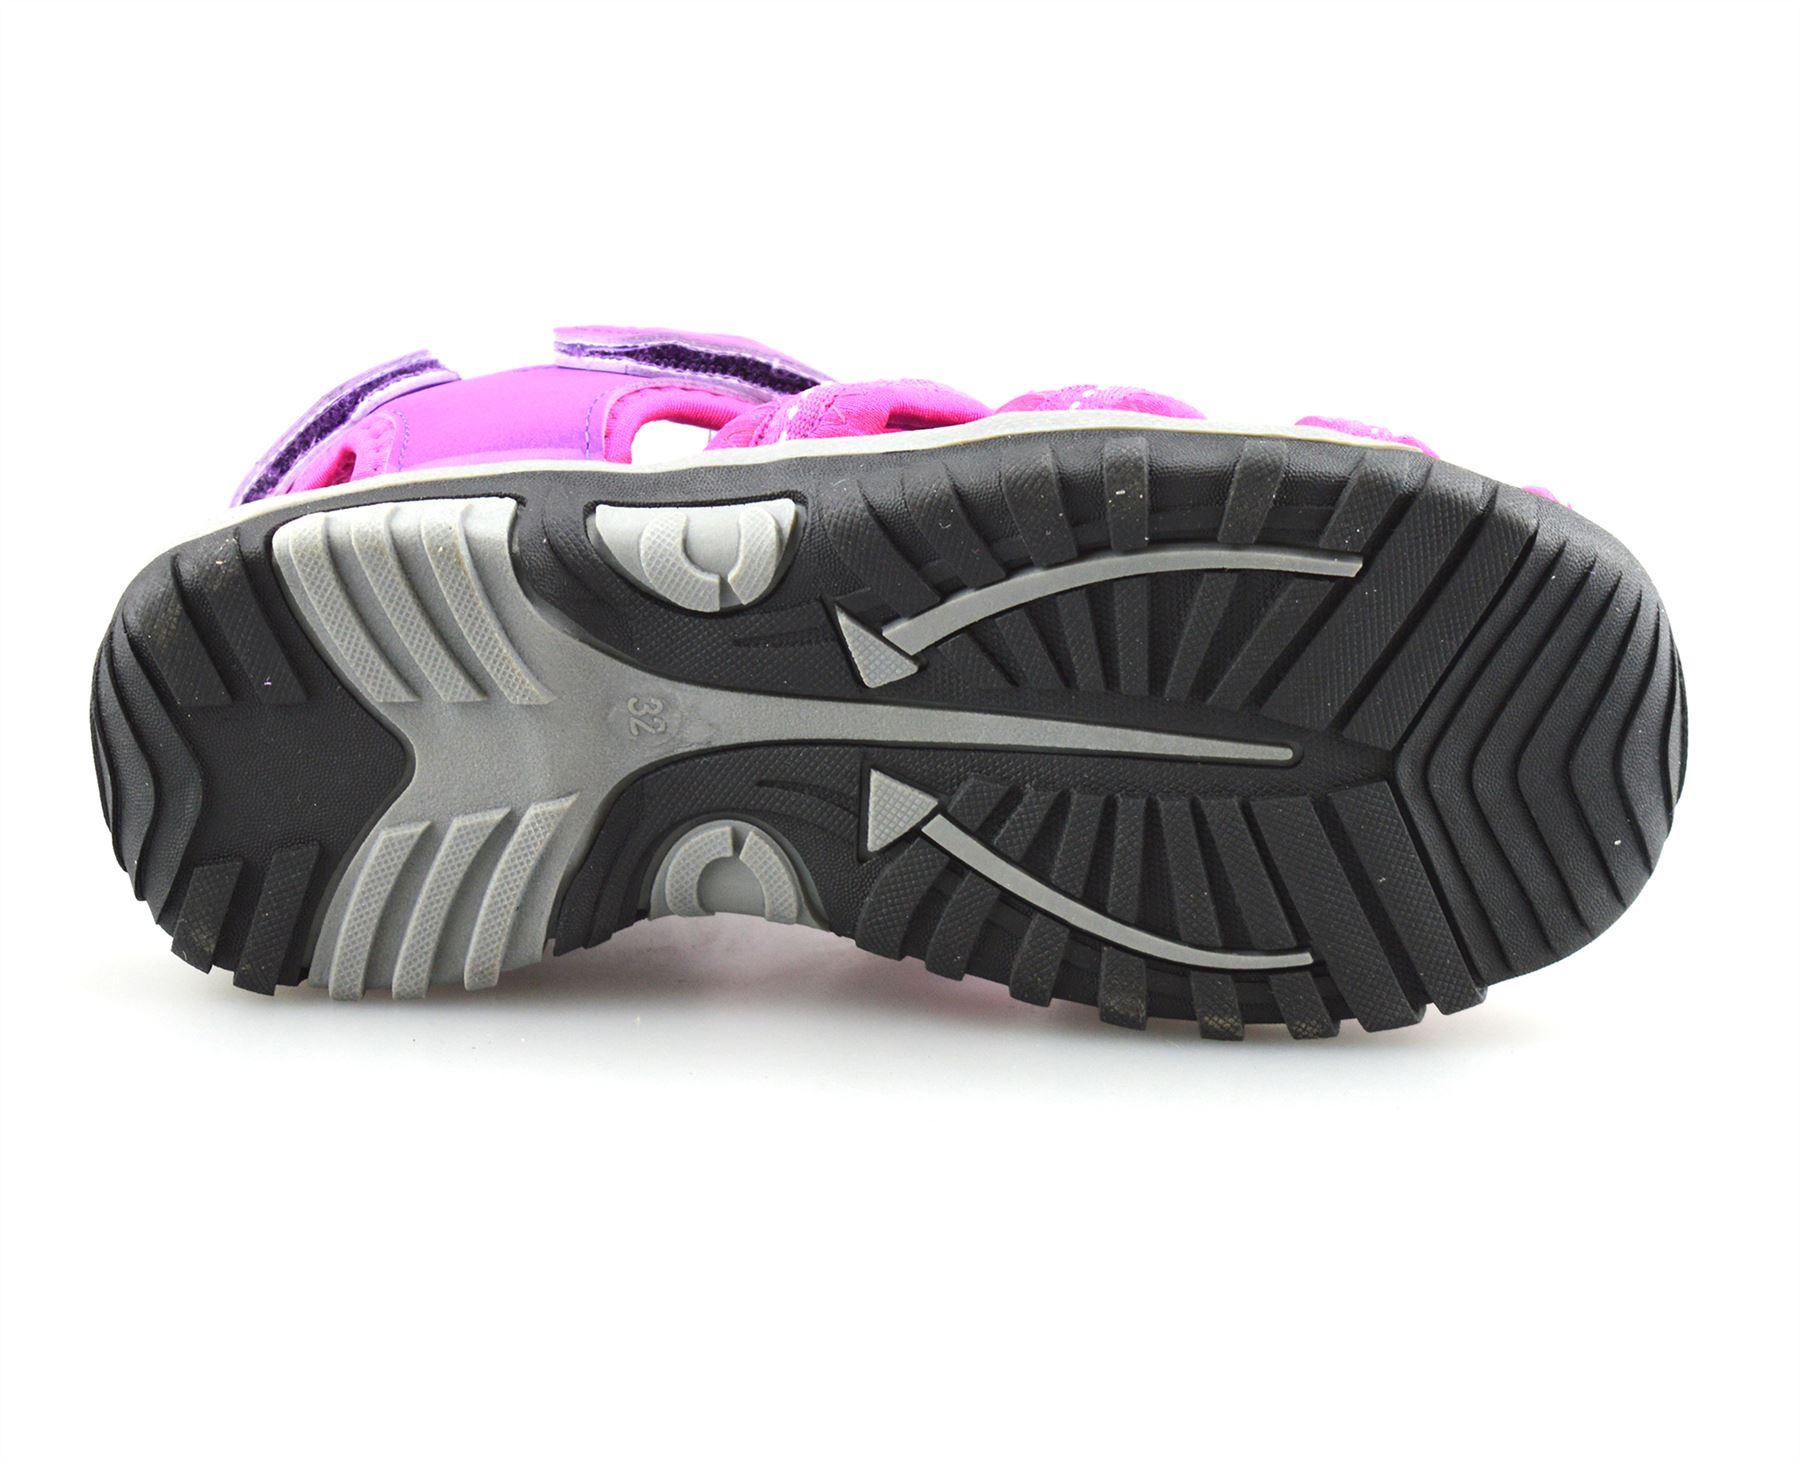 Boys-Girls-Kids-Trespass-Summer-Beach-Casual-Walking-Sports-Sandals-Shoes-Size thumbnail 20